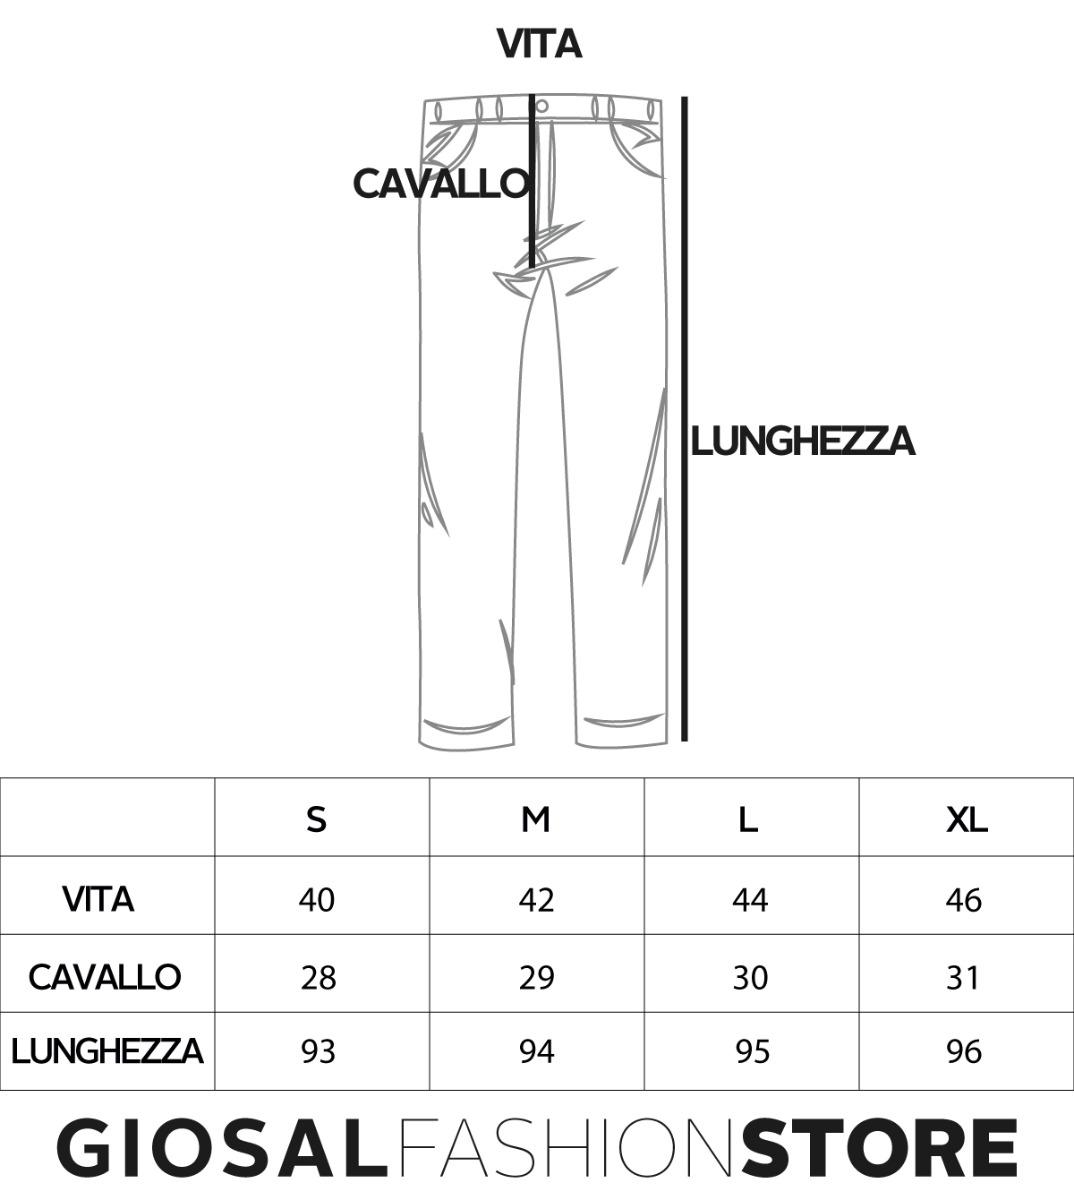 Pantalone-Uomo-Tinta-Unita-Blu-Tasca-America-Cavallo-Basso-Misto-Lino-Viscosa miniatura 7